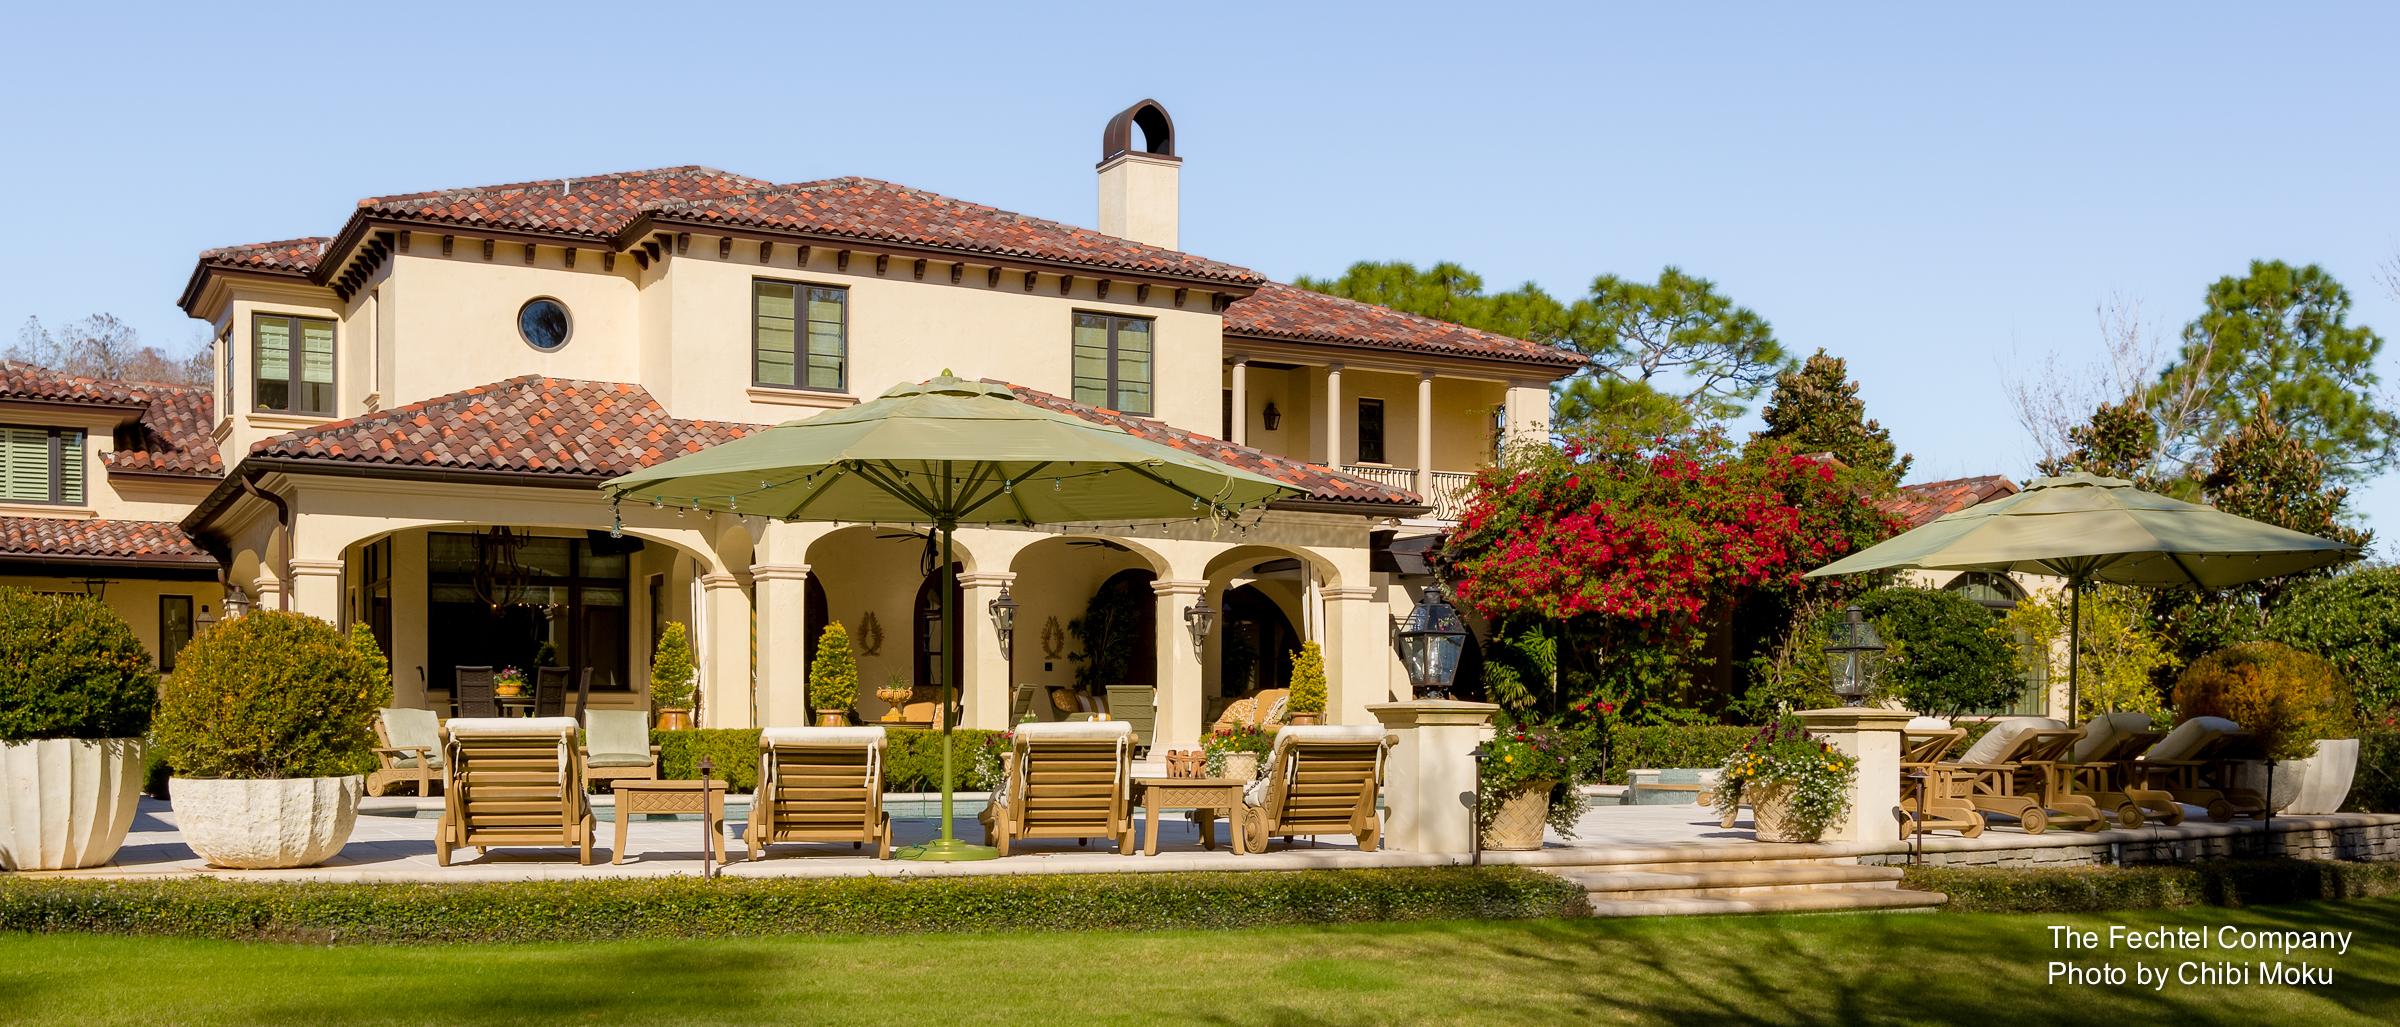 The Fechtel Company Villa Pavia Tampa FL Chibi Moku